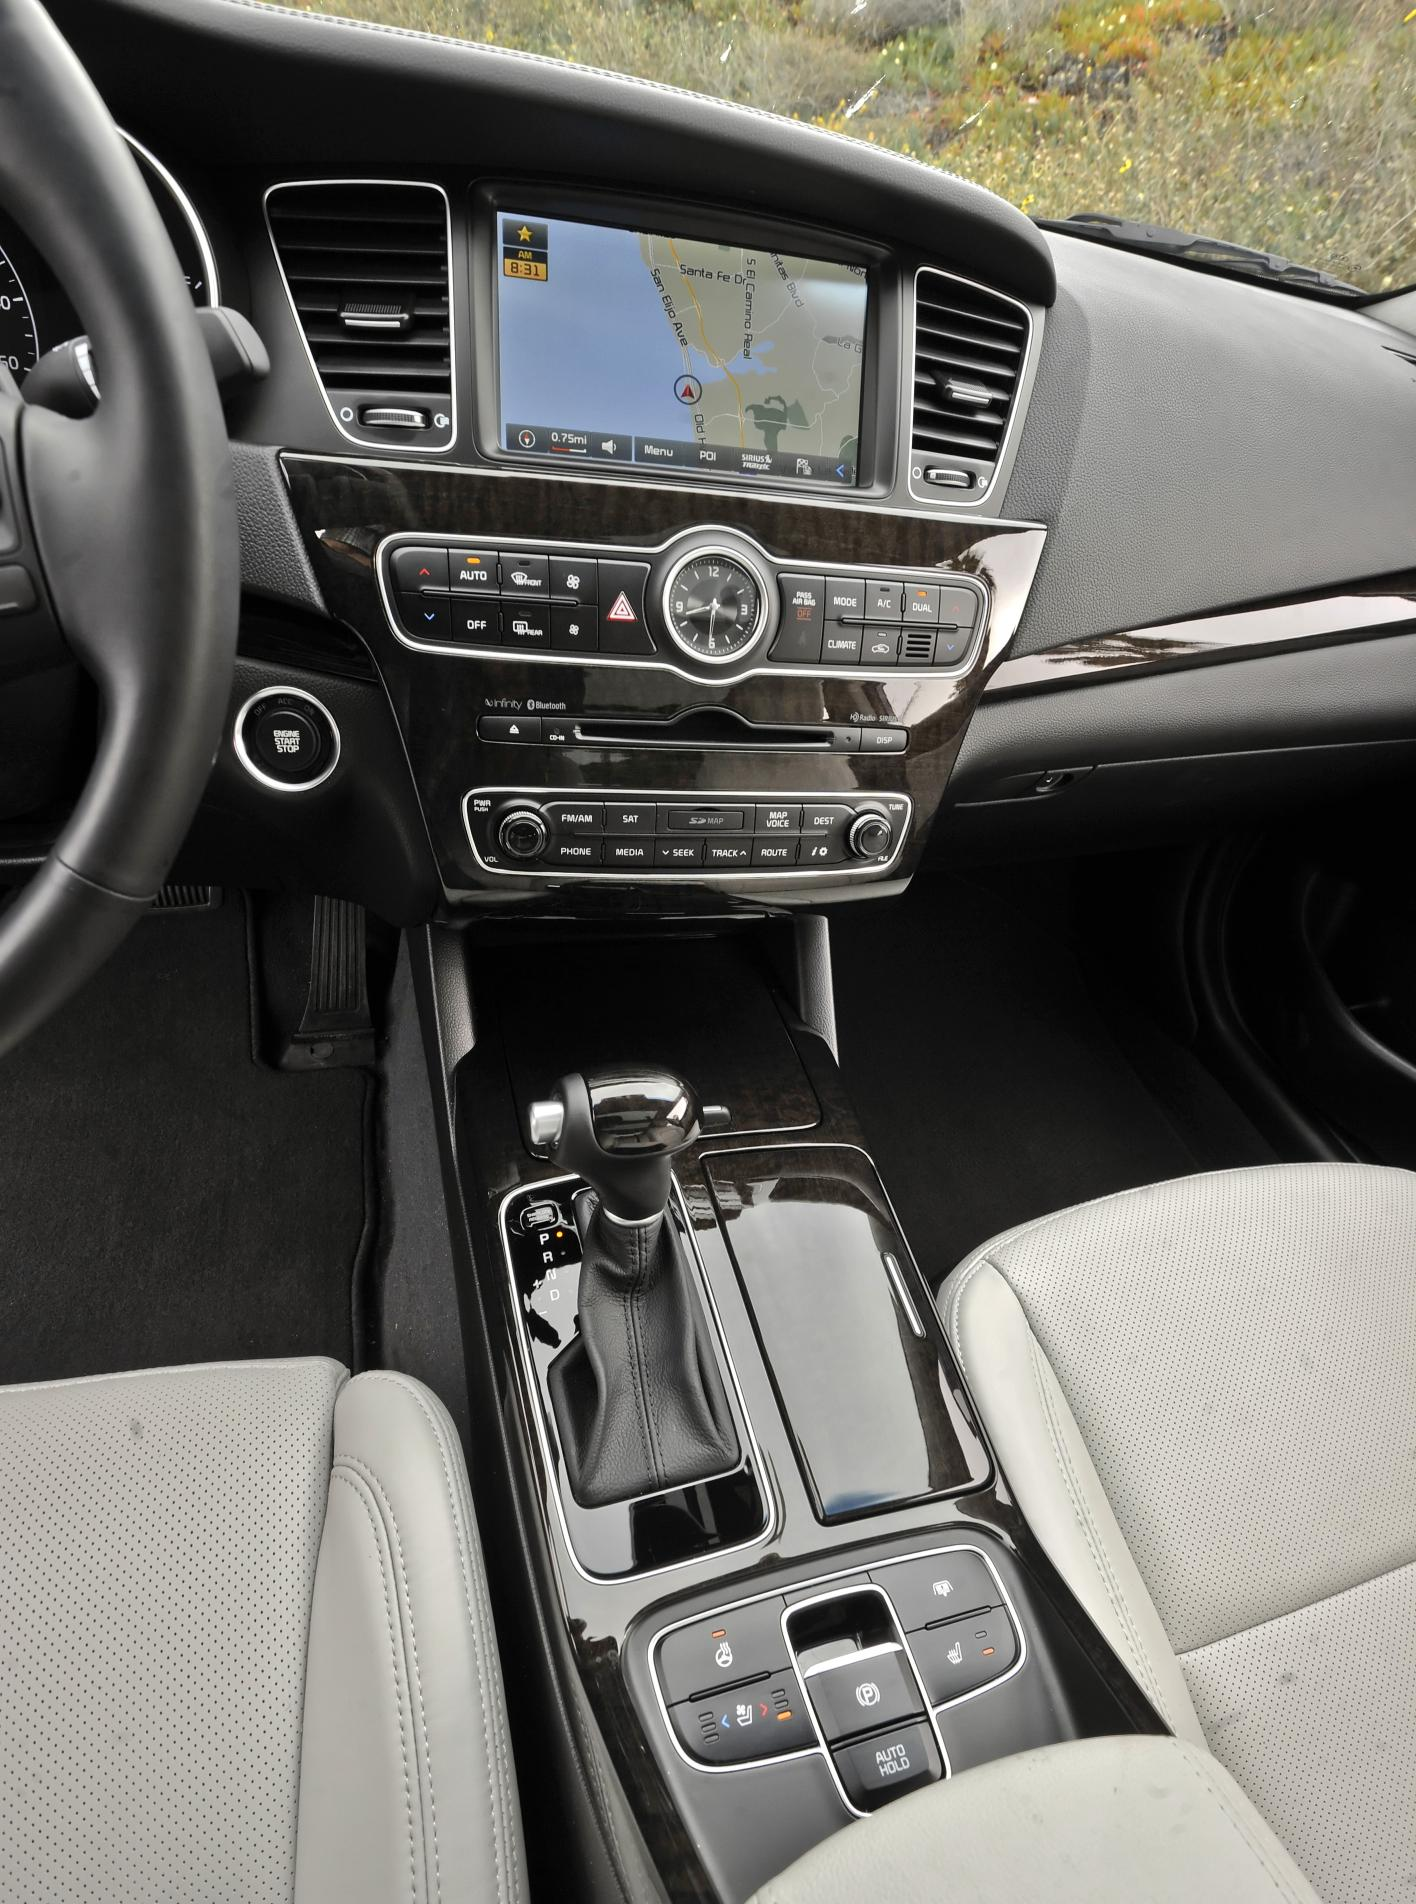 2015 Kia Cadenza Adds New Tech And Visual Enhancements